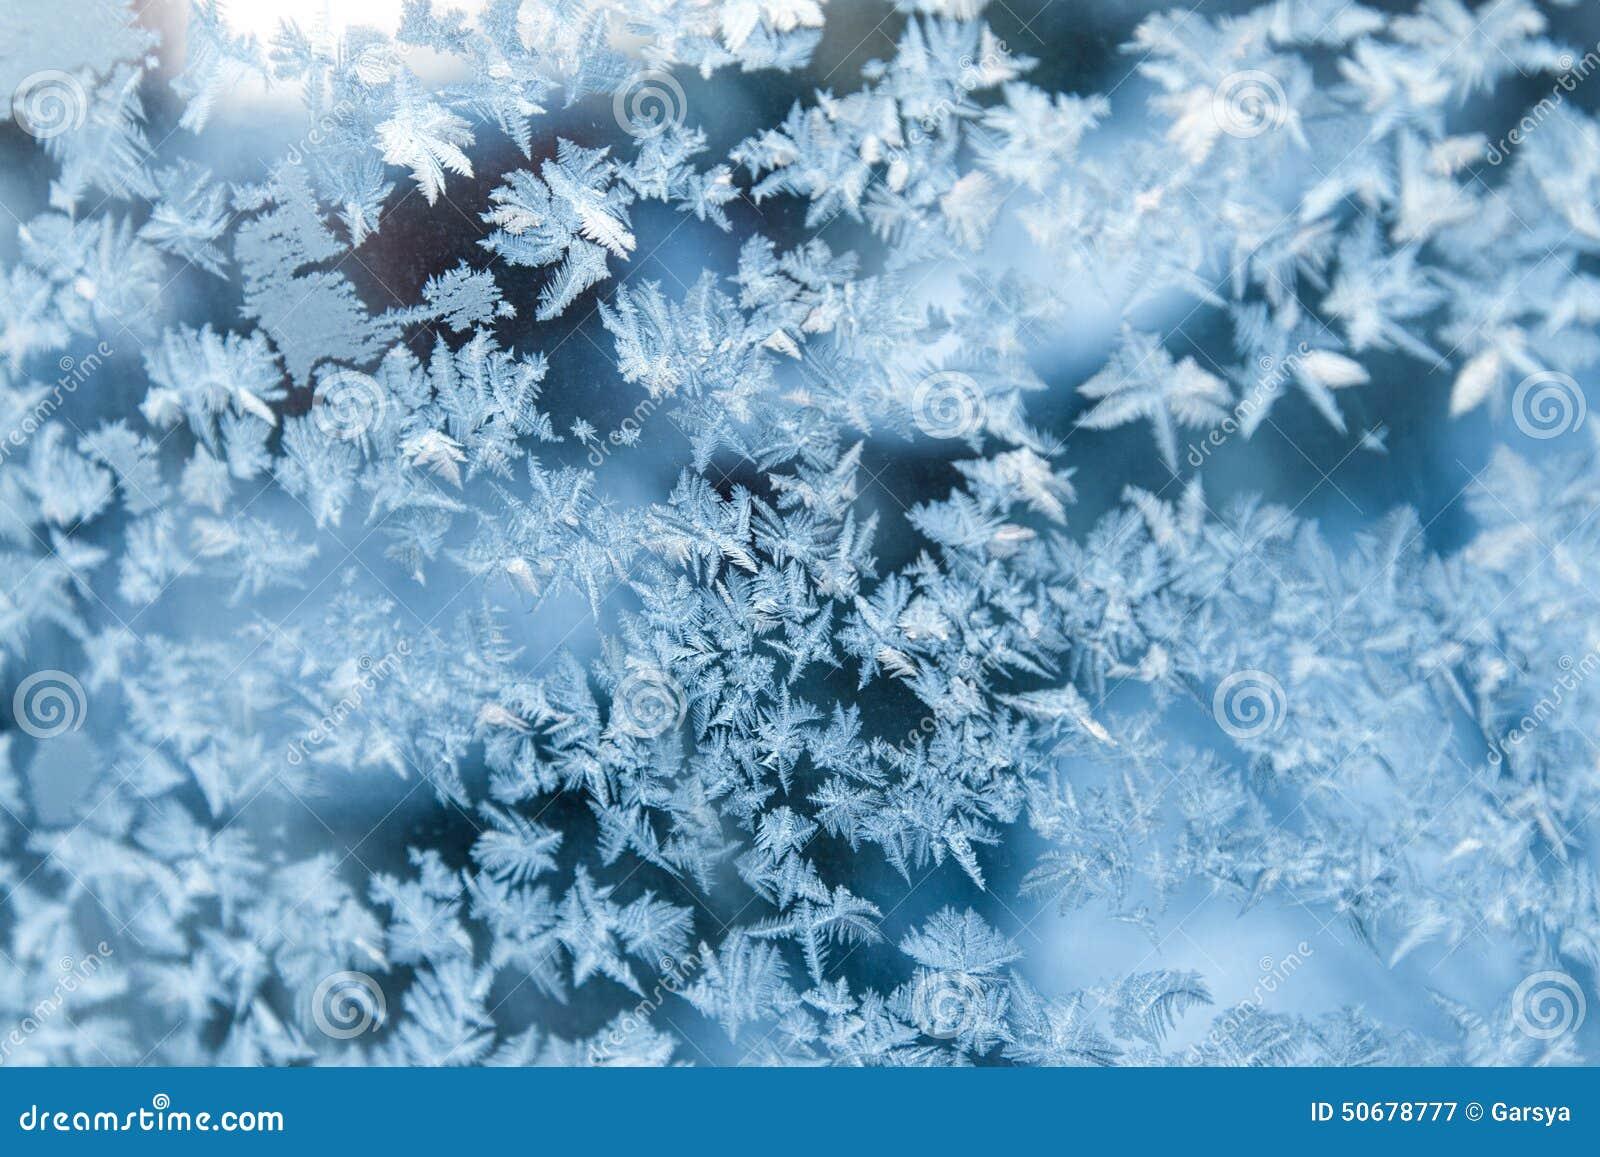 Download 发光的冬天窗冰装饰 库存图片. 图片 包括有 设计, 气候, 抽象, 季节, 冰冷, 特写镜头, 冻结, 照亮 - 50678777